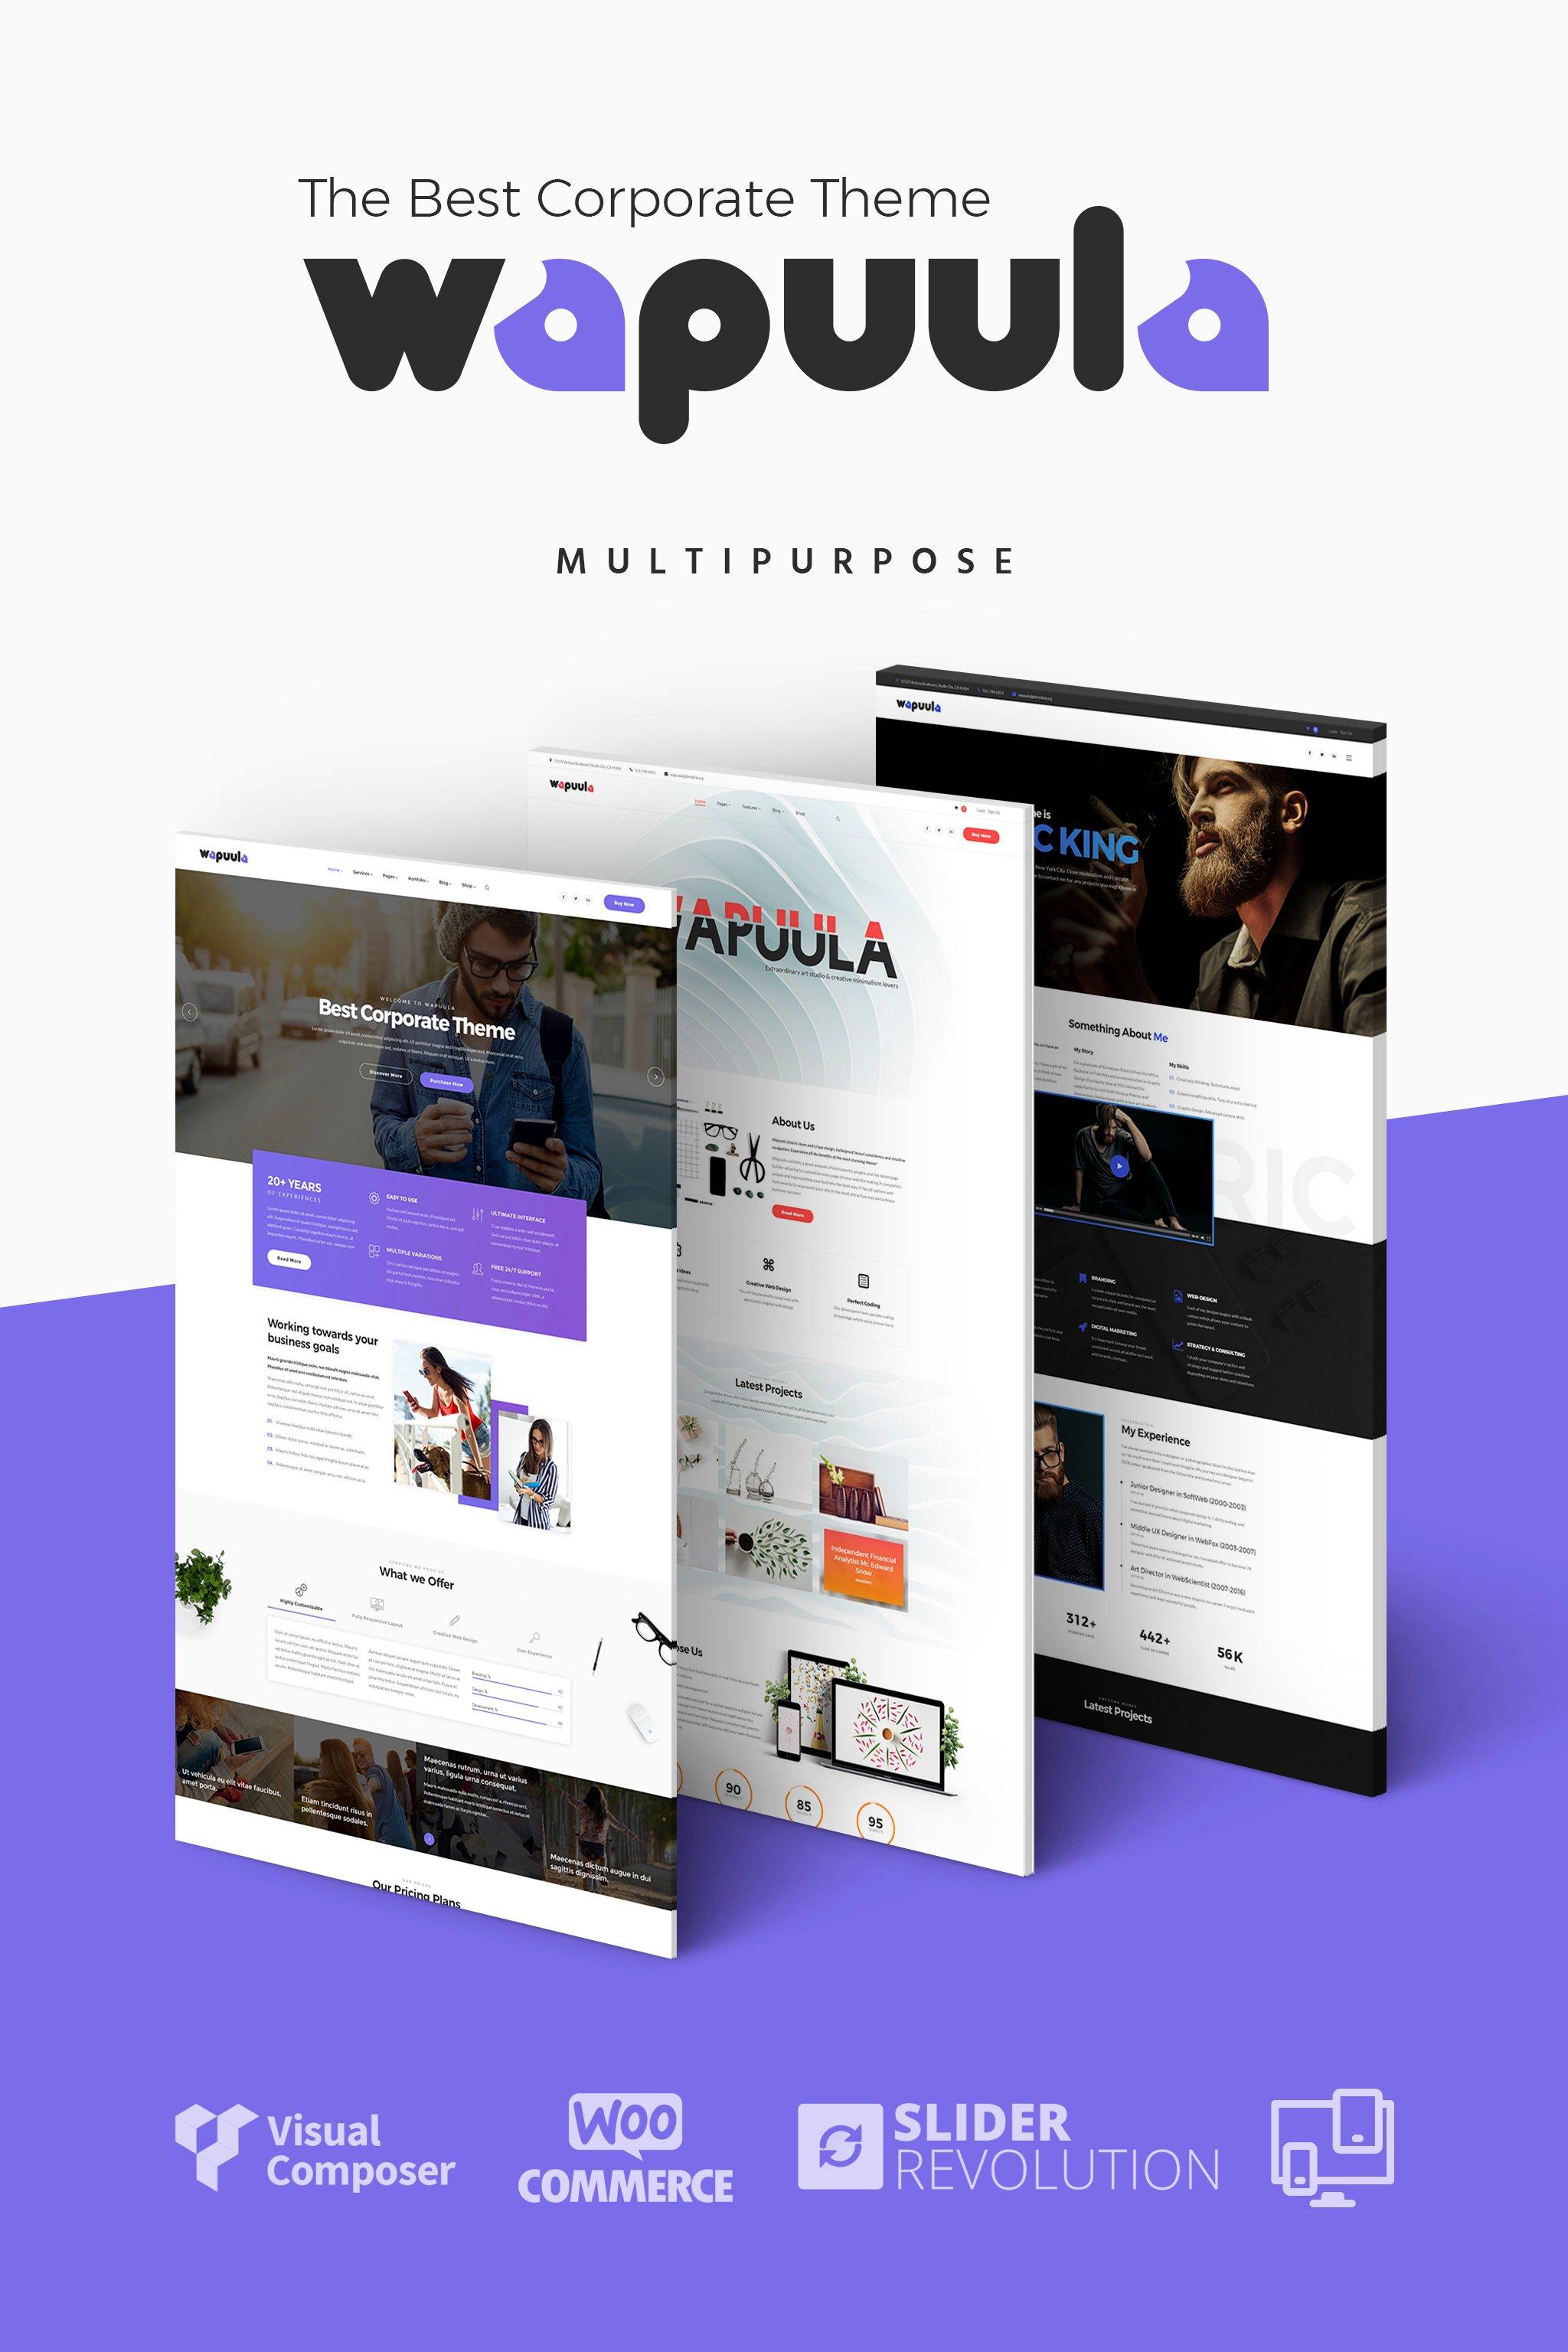 Wapuula - Multipurpose Corporate WordPress Theme WordPress Theme